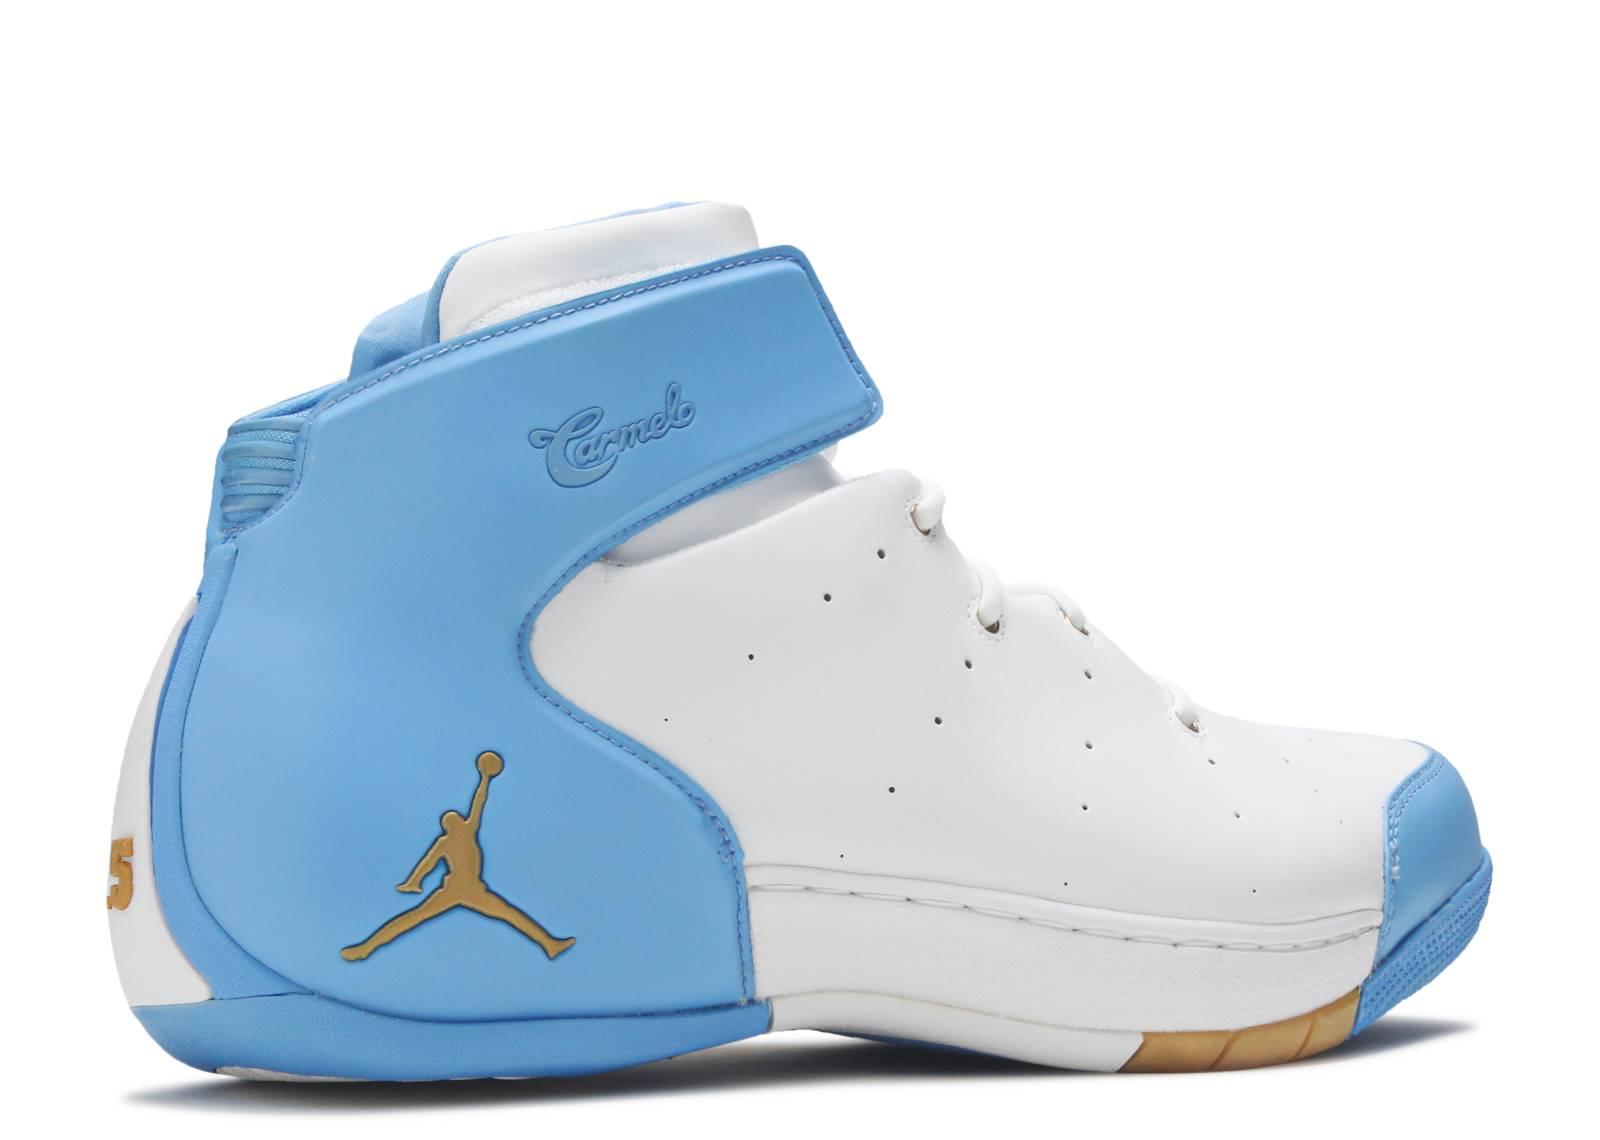 c95efcece473 Jordan Carmelo 1.5 - Air Jordan - 309265 171 - white metallic gold ...